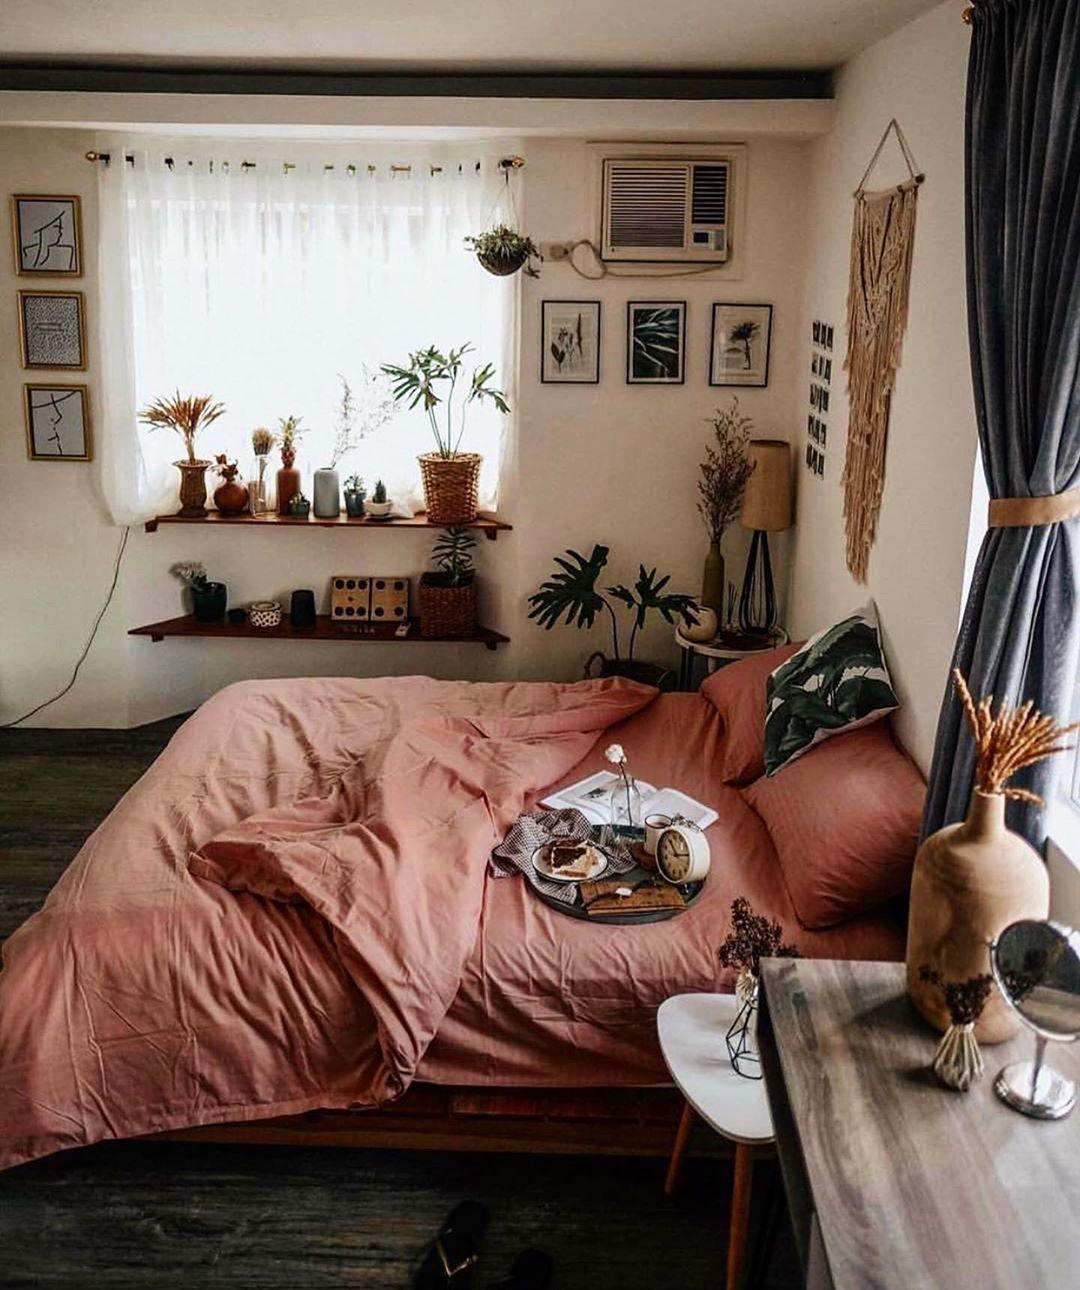 Modern Bohemian Bedroom Decor Ideas Small Room Bedroom Aesthetic Room Decor Bedroom Decor